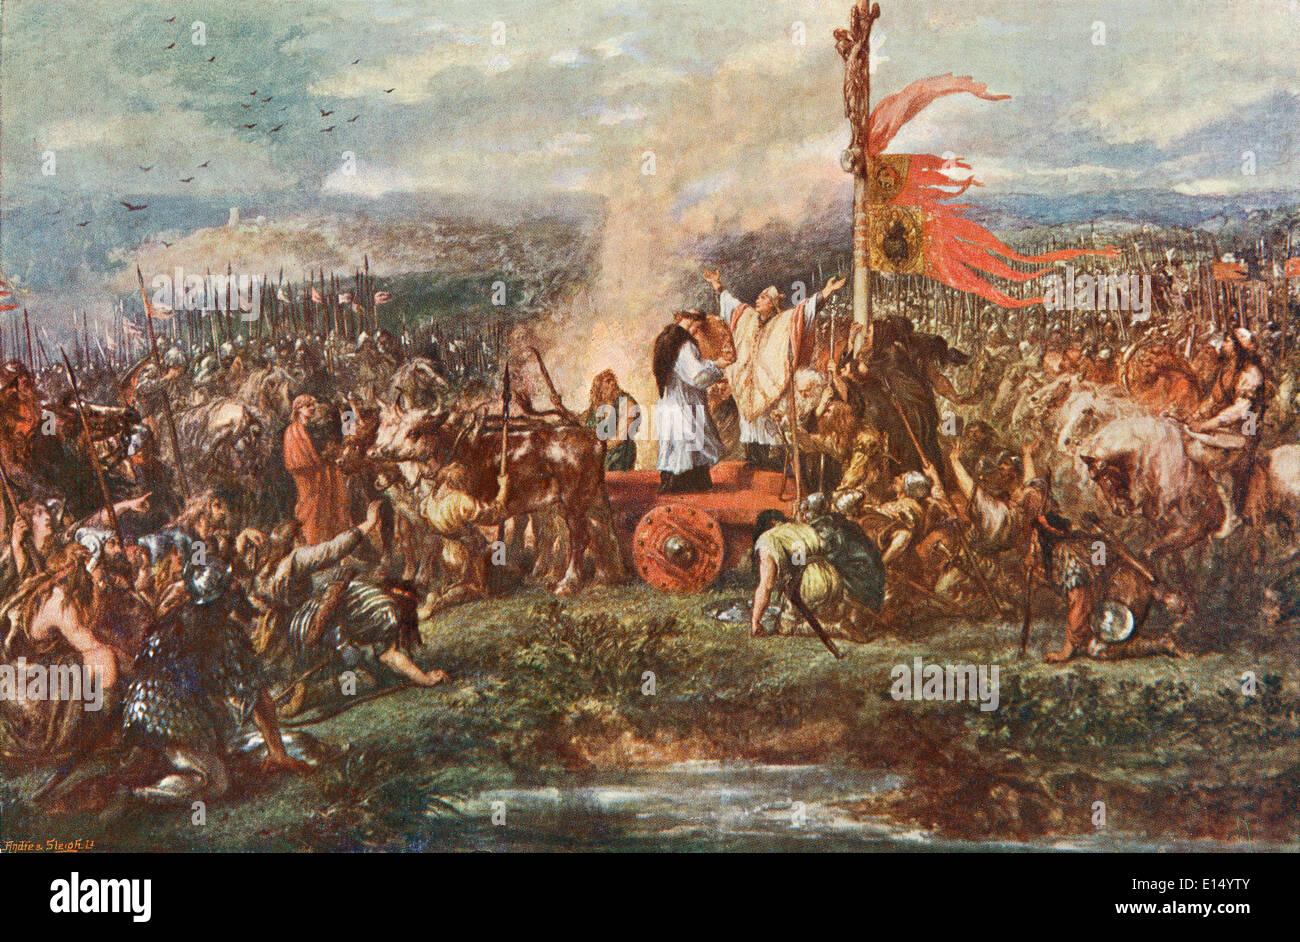 The Battle of the Standard, aka the Battle of Northallerton, 22 August 1138, Cowton Moor near Northallerton,Yorkshire, England. - Stock Image